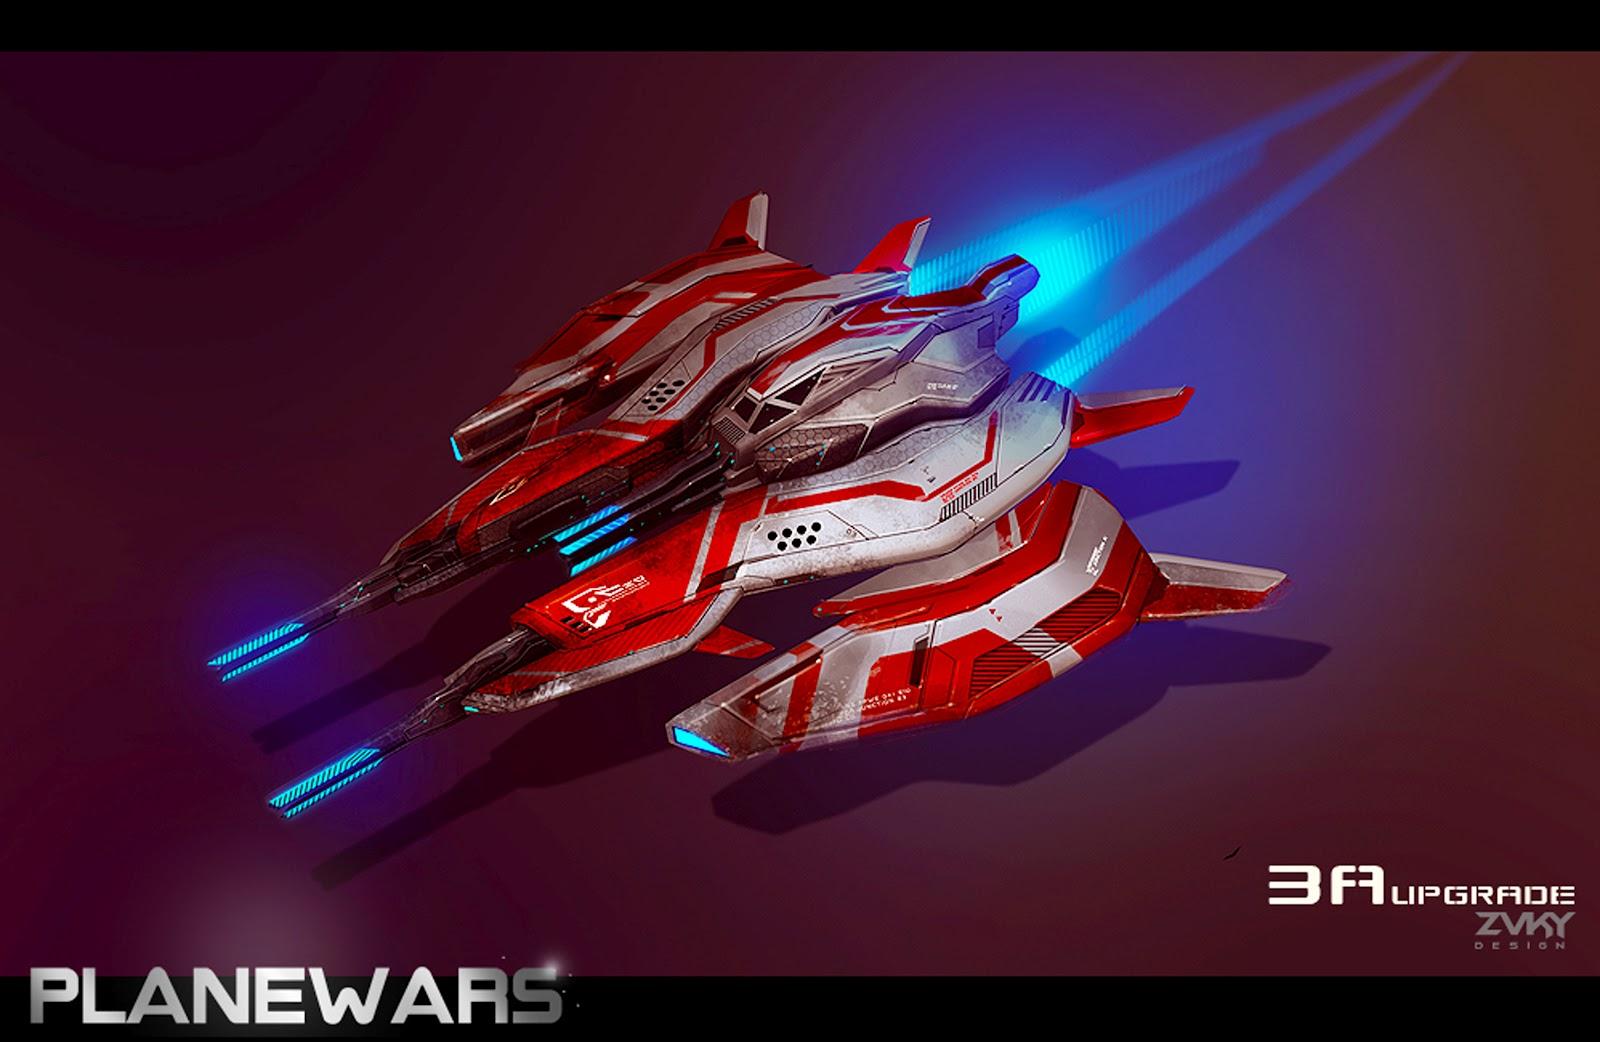 Futuristic Spacecraft Designs - Pics about space